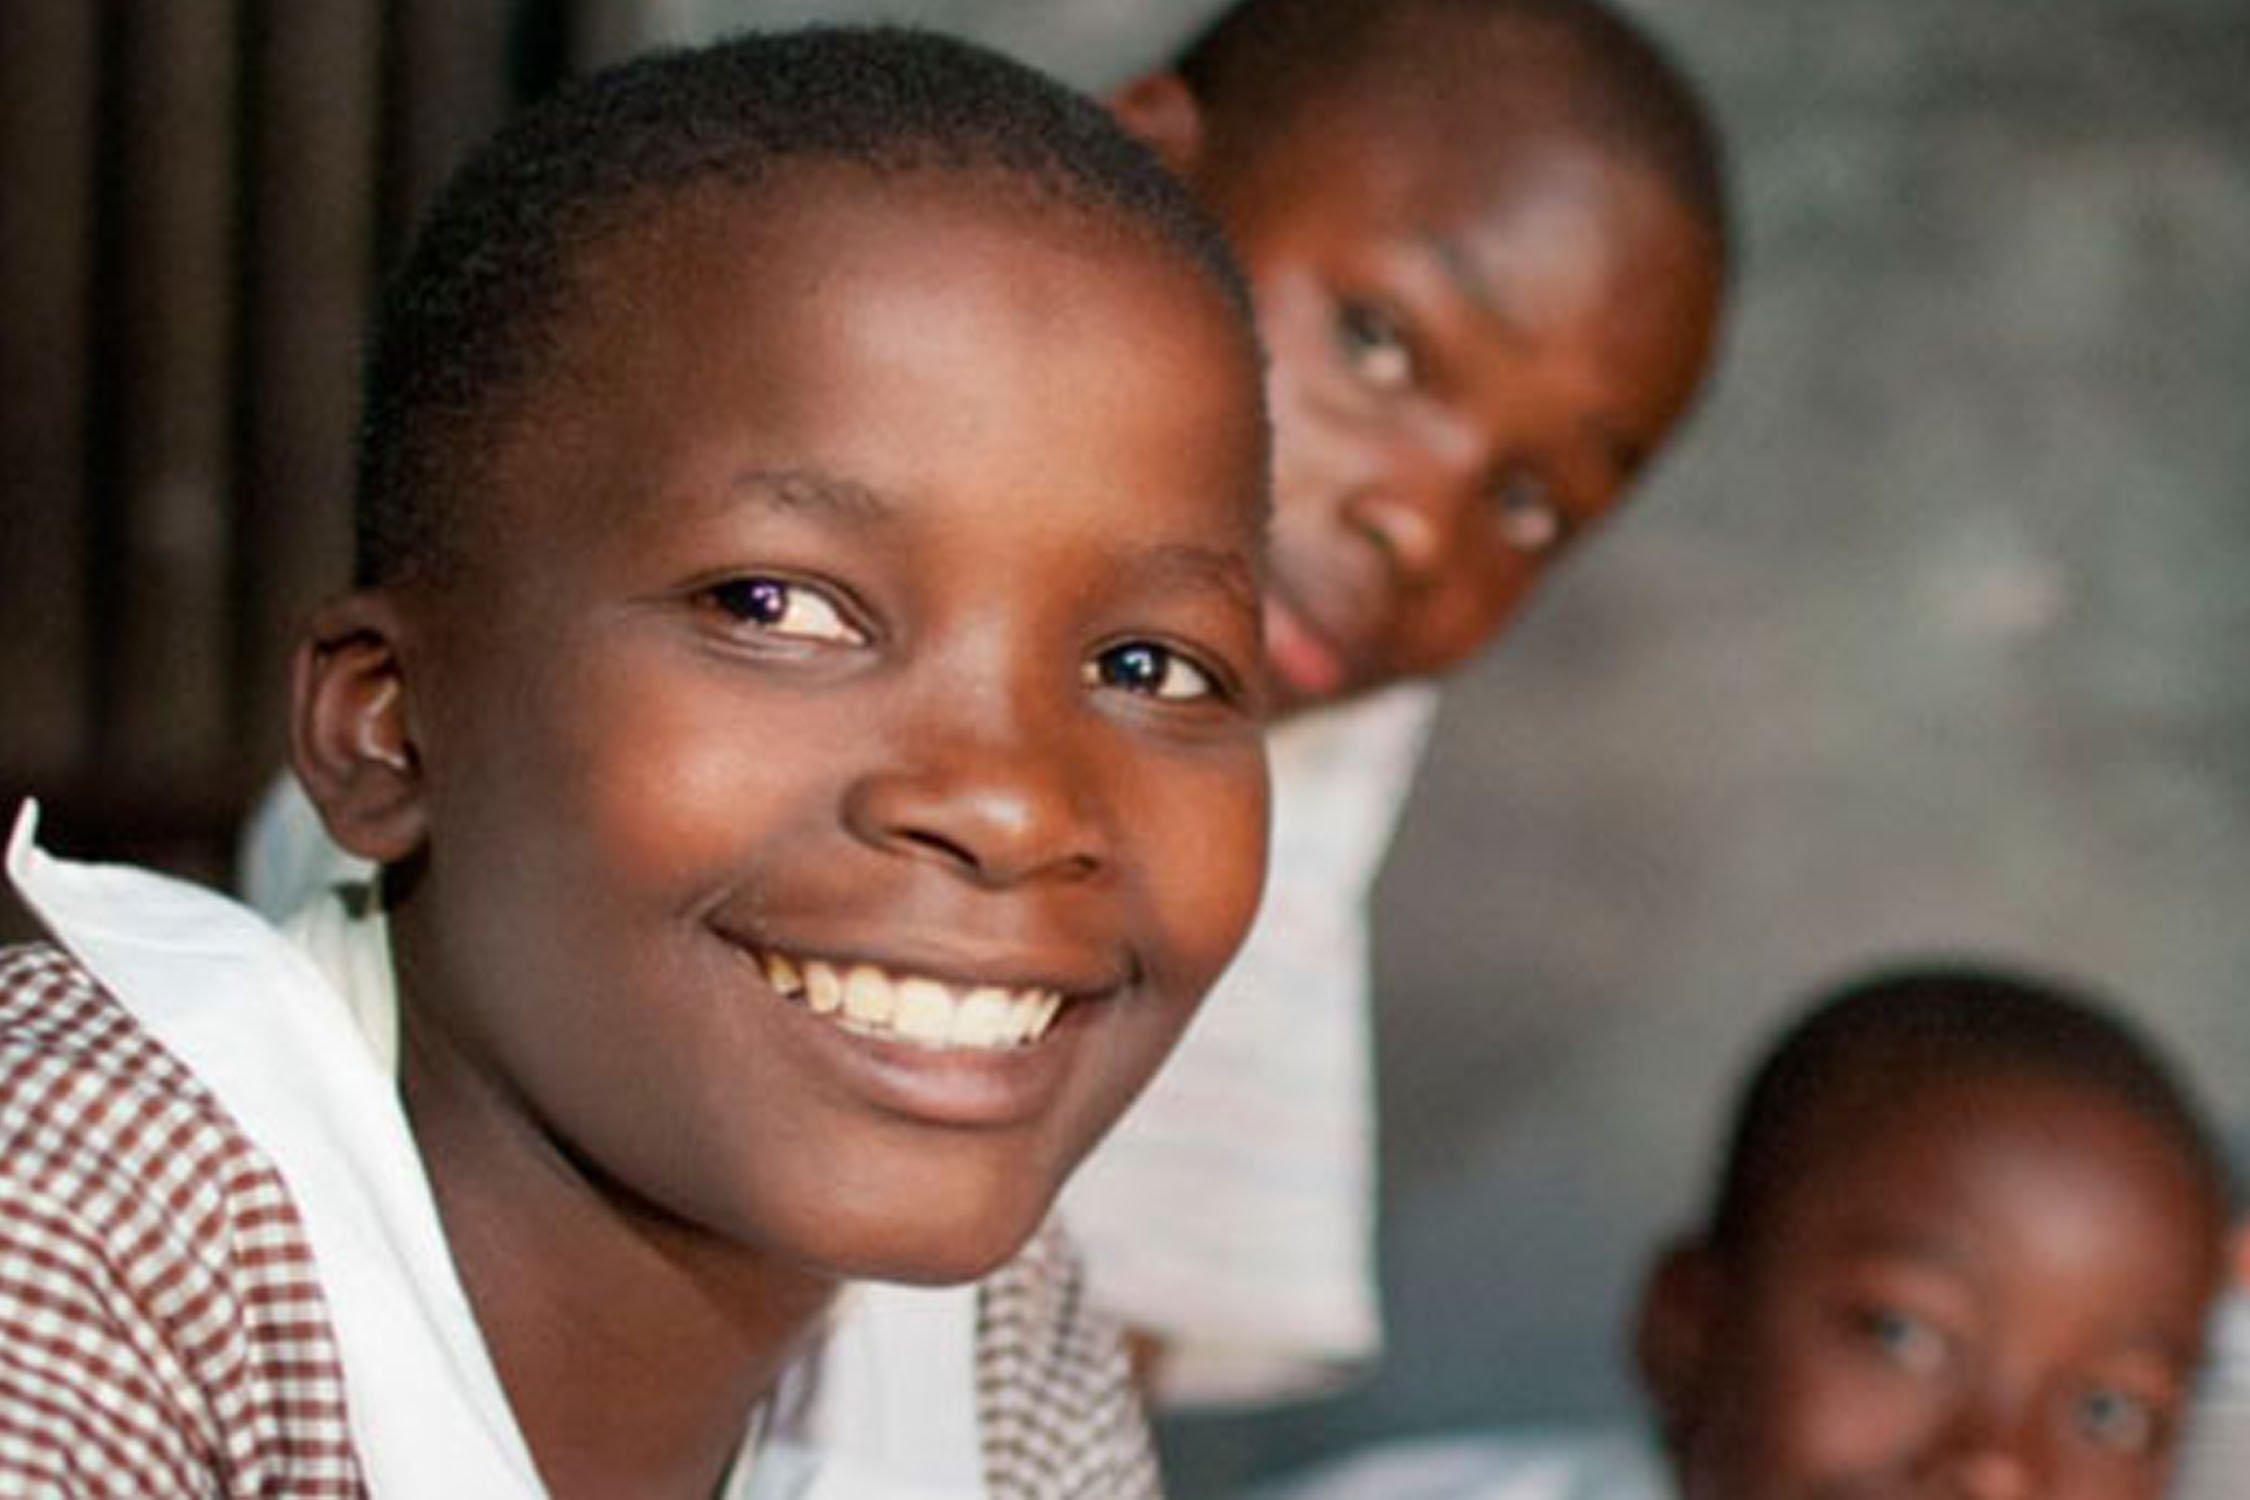 First Aid Training for Caretakers: Kenya